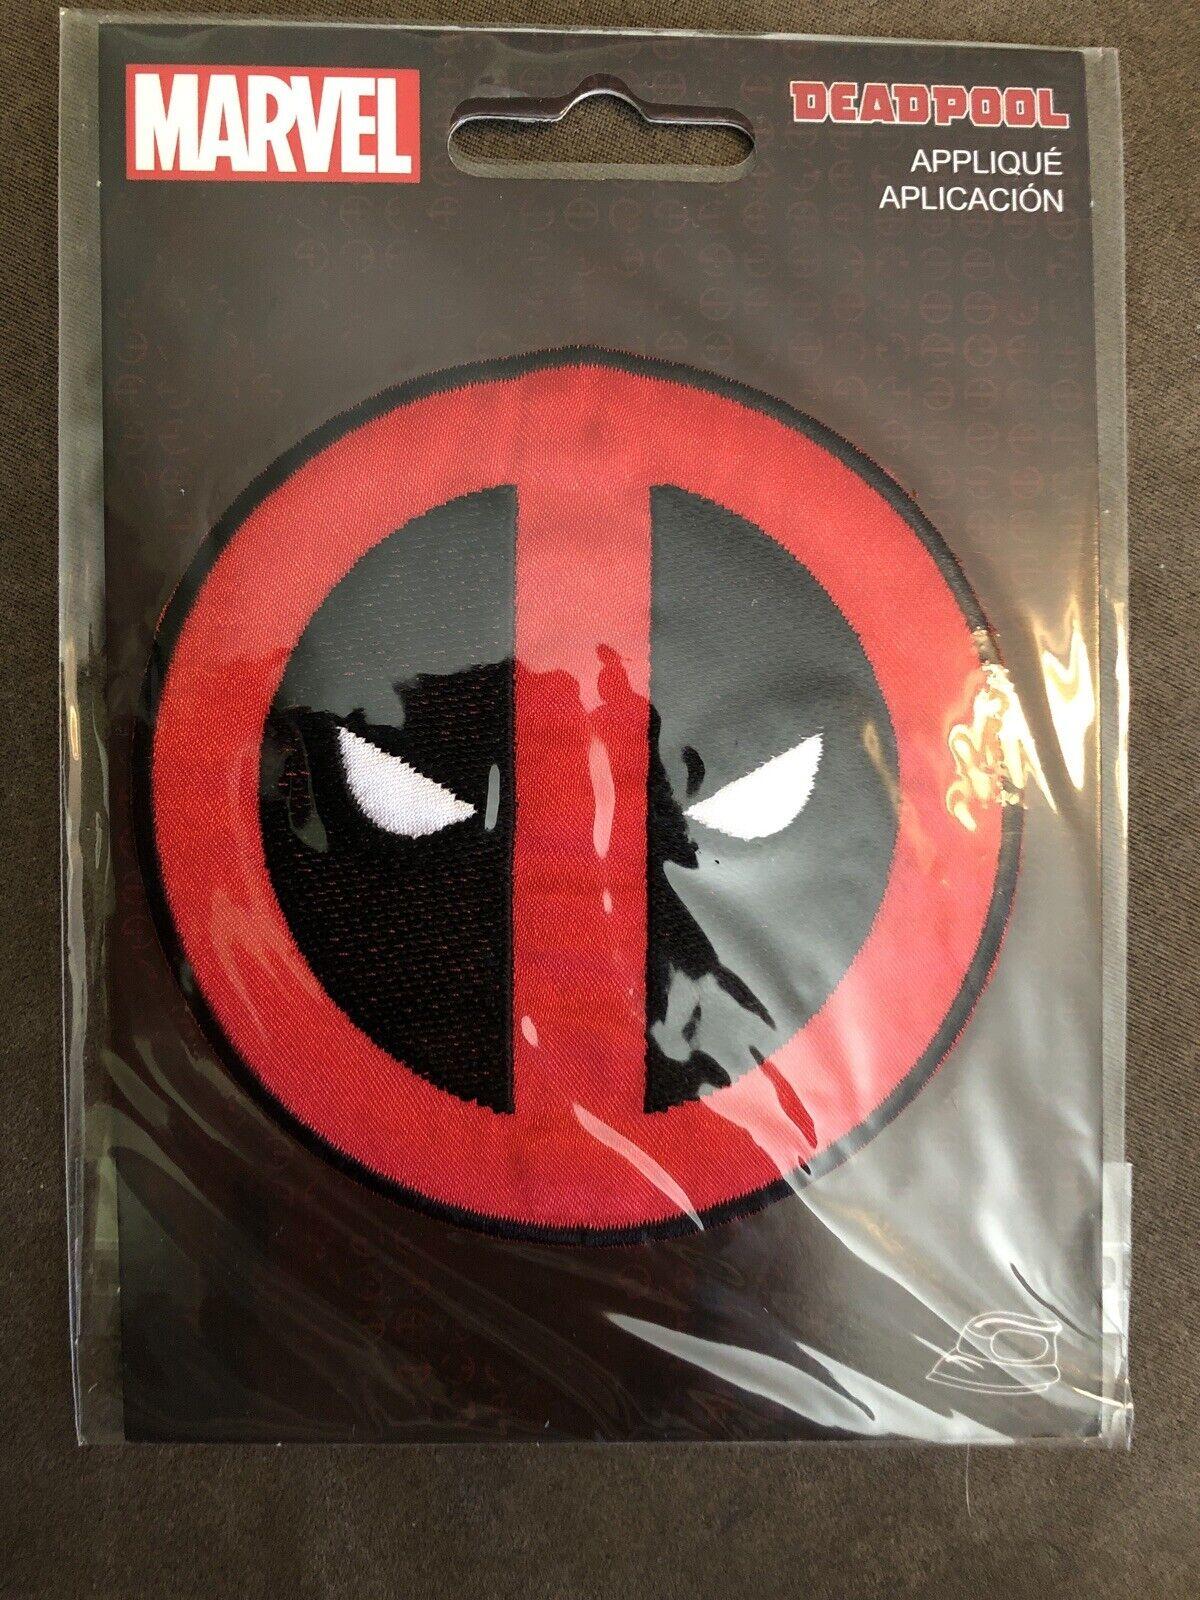 DEADPOOL MARVEL SUPERHERO COMICS MOVIE Embroidered Iron Sew On Patch Logo